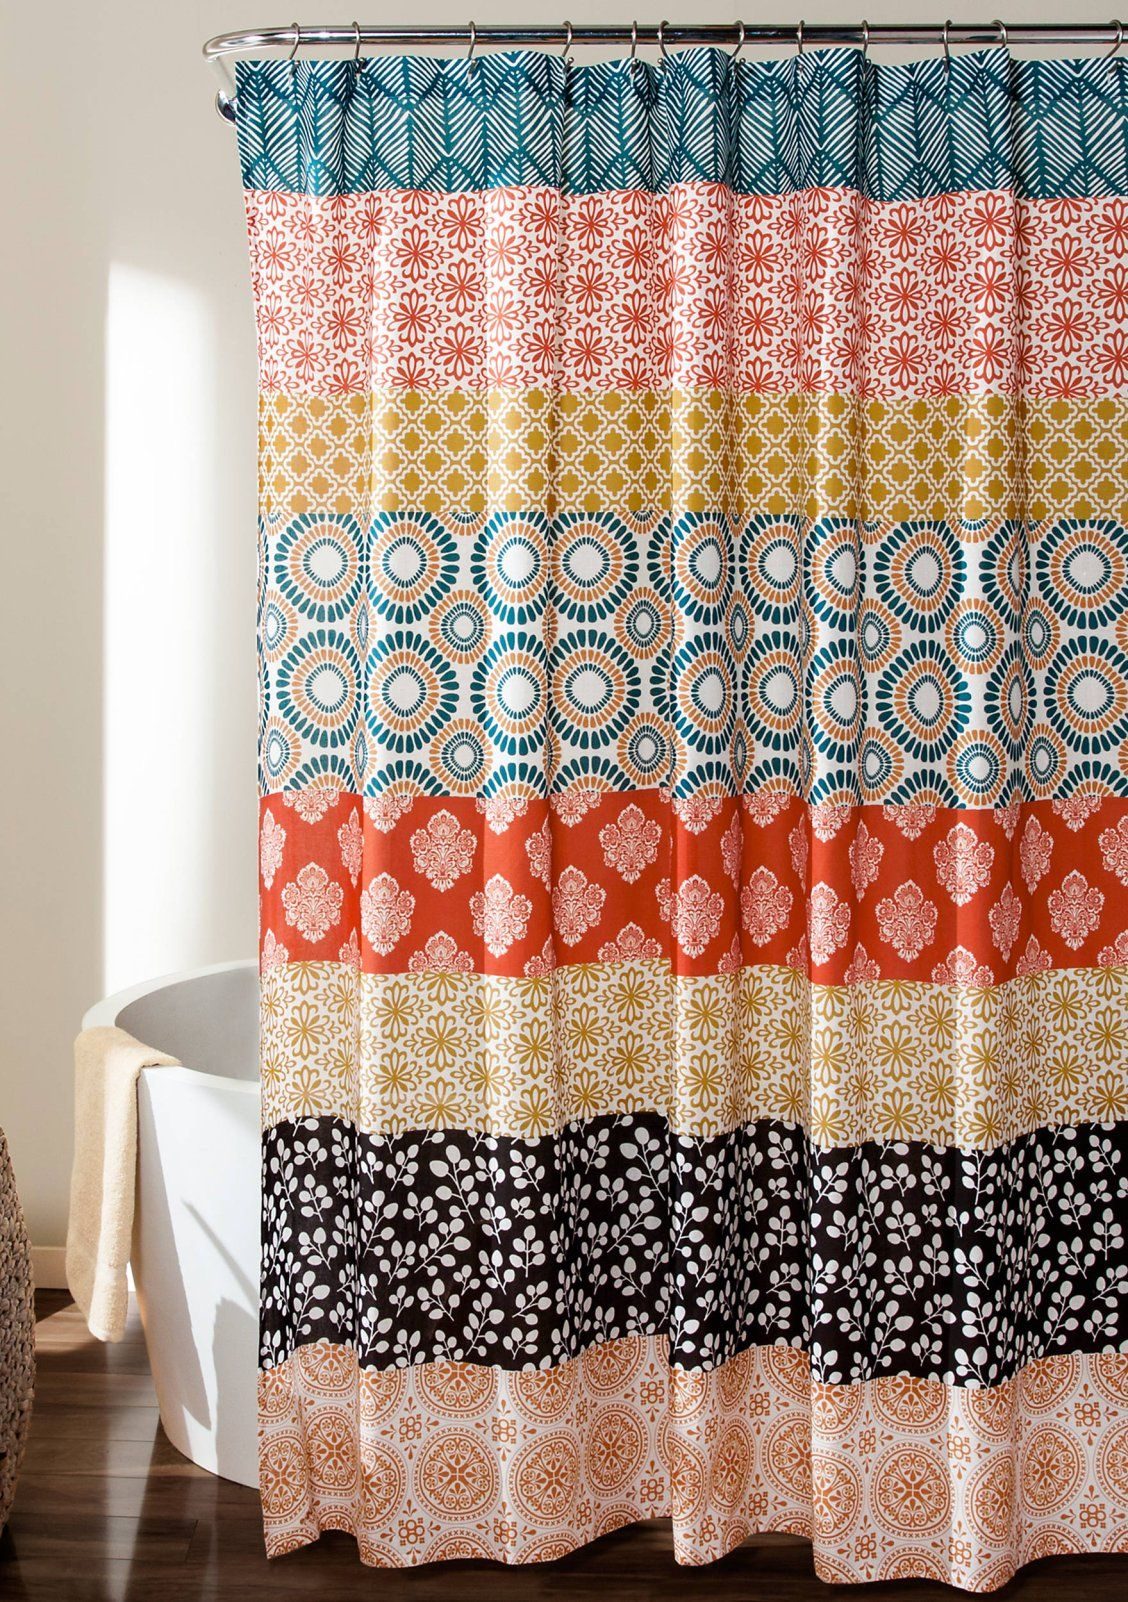 Lush Decor Bohemian Stripe Shower Curtain Turquoise Orange 72 In X